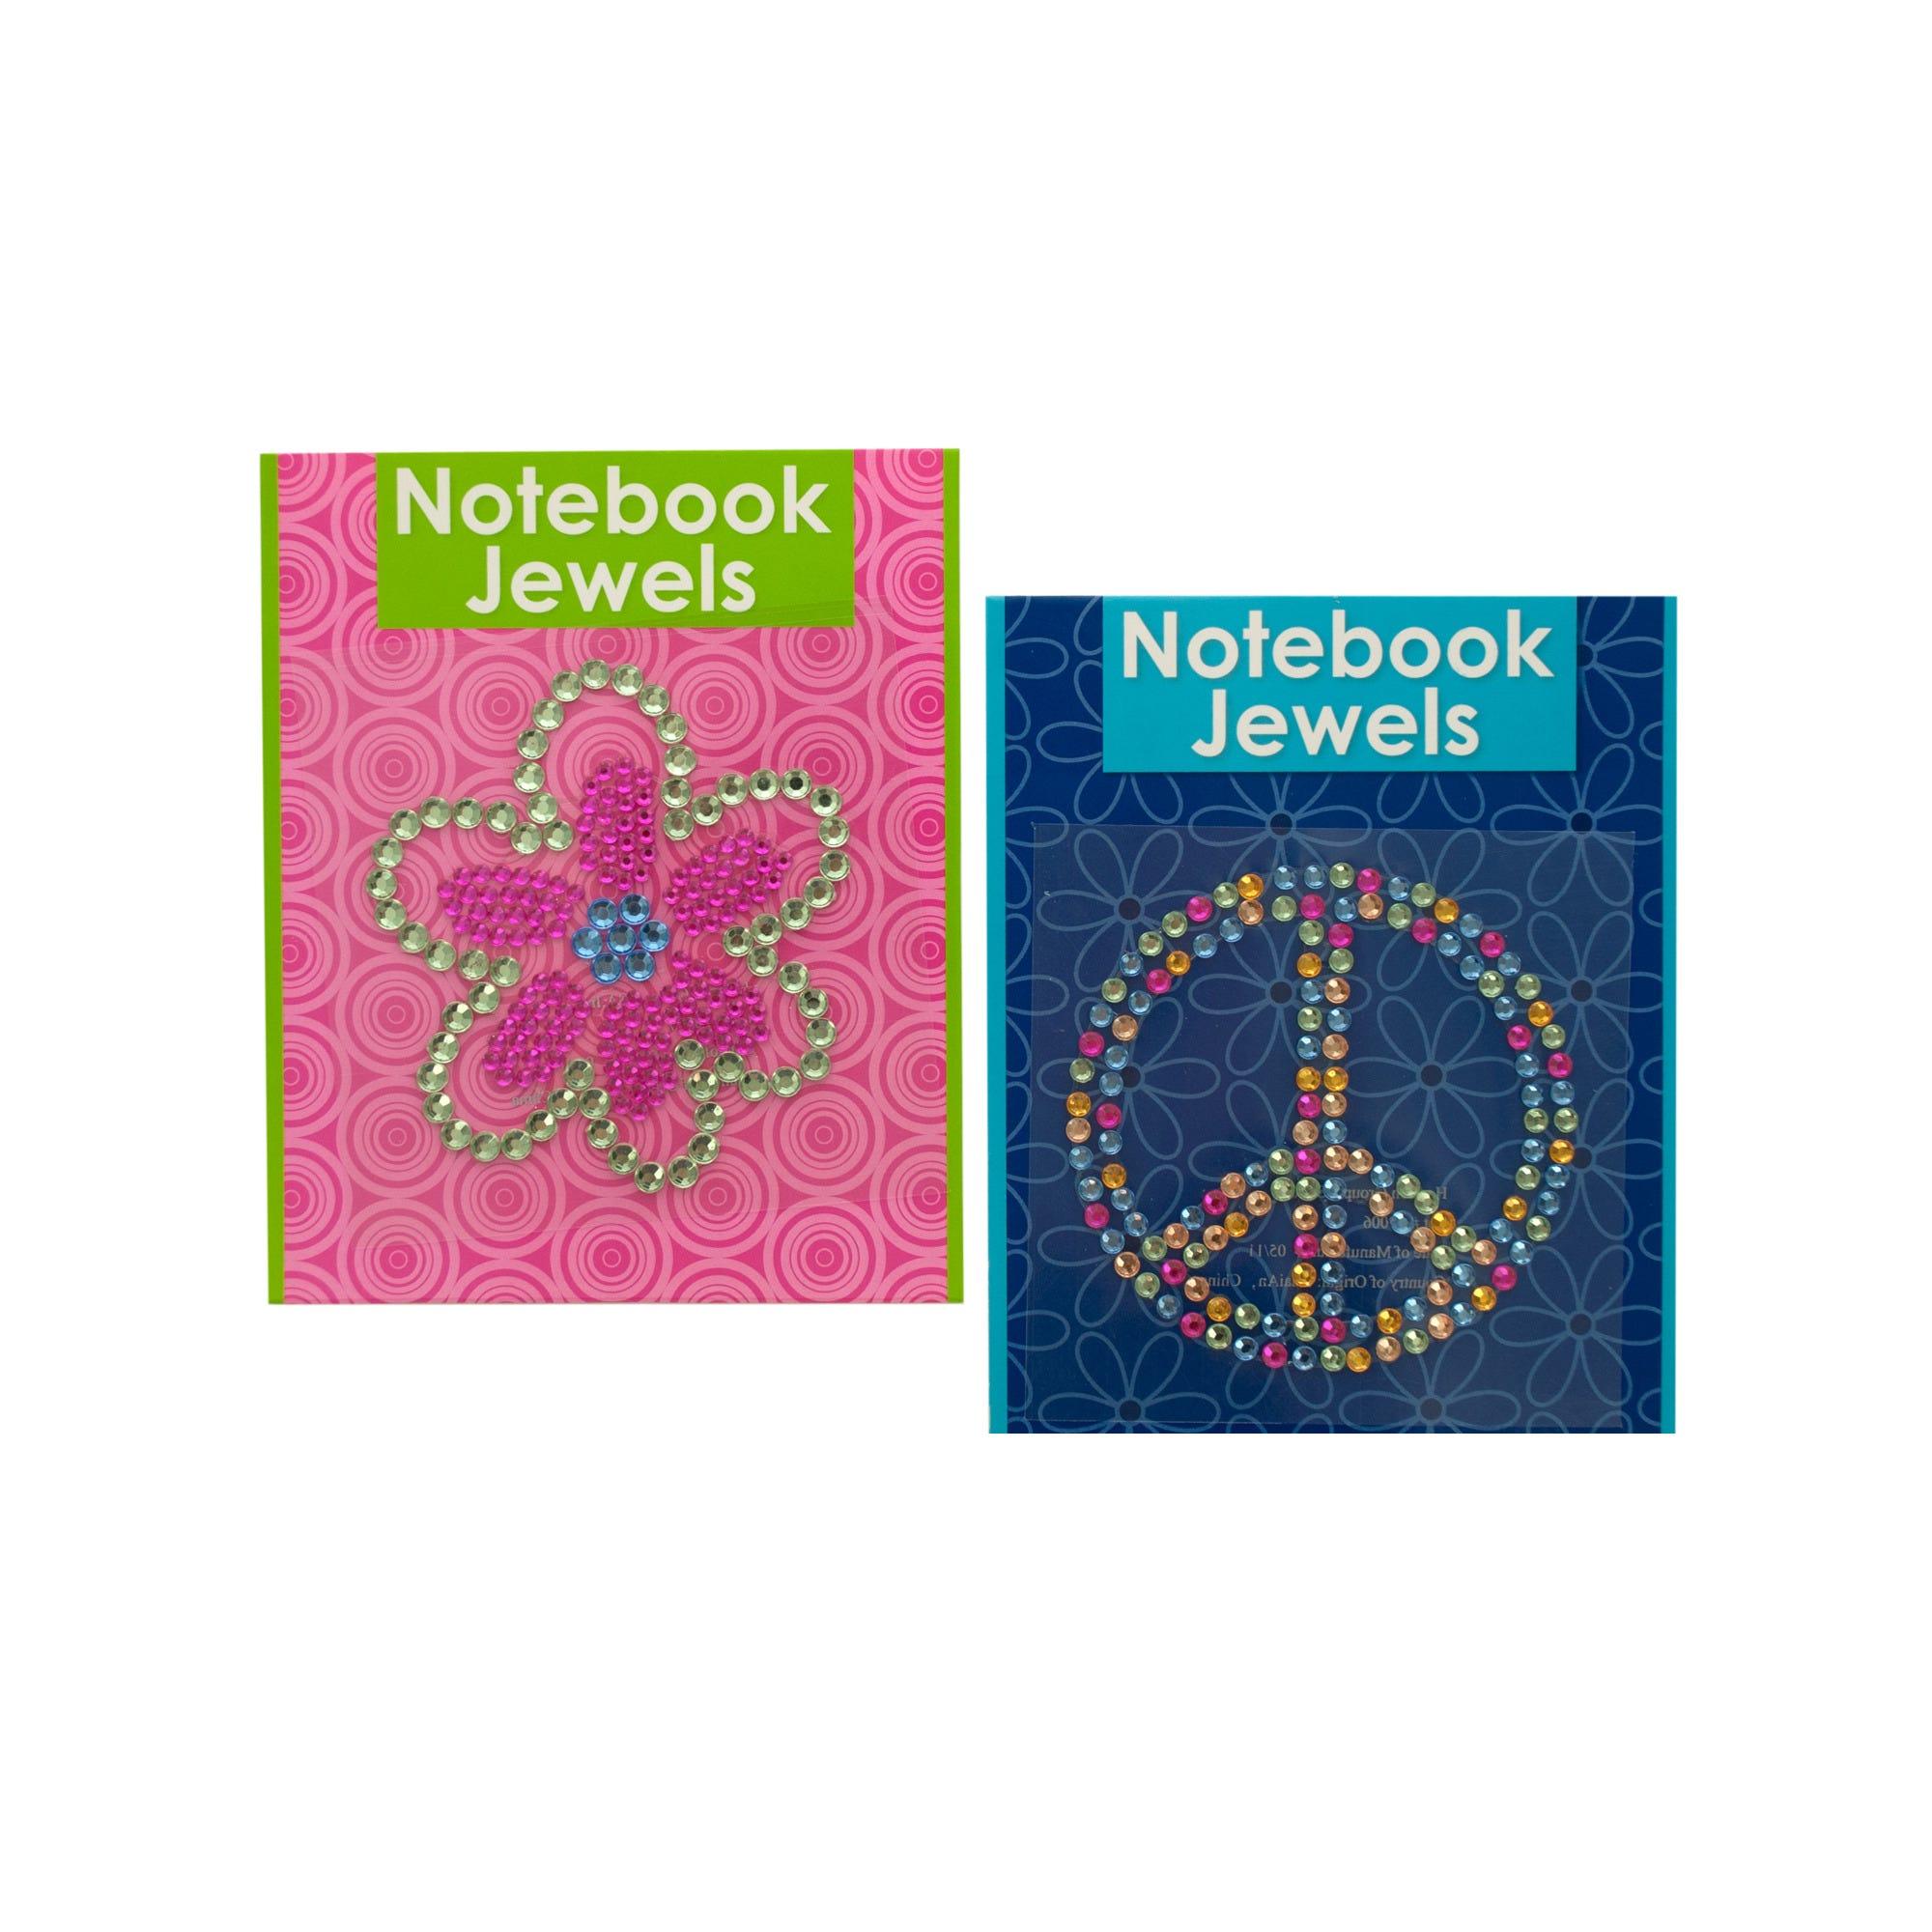 NOTEBOOK-jewels